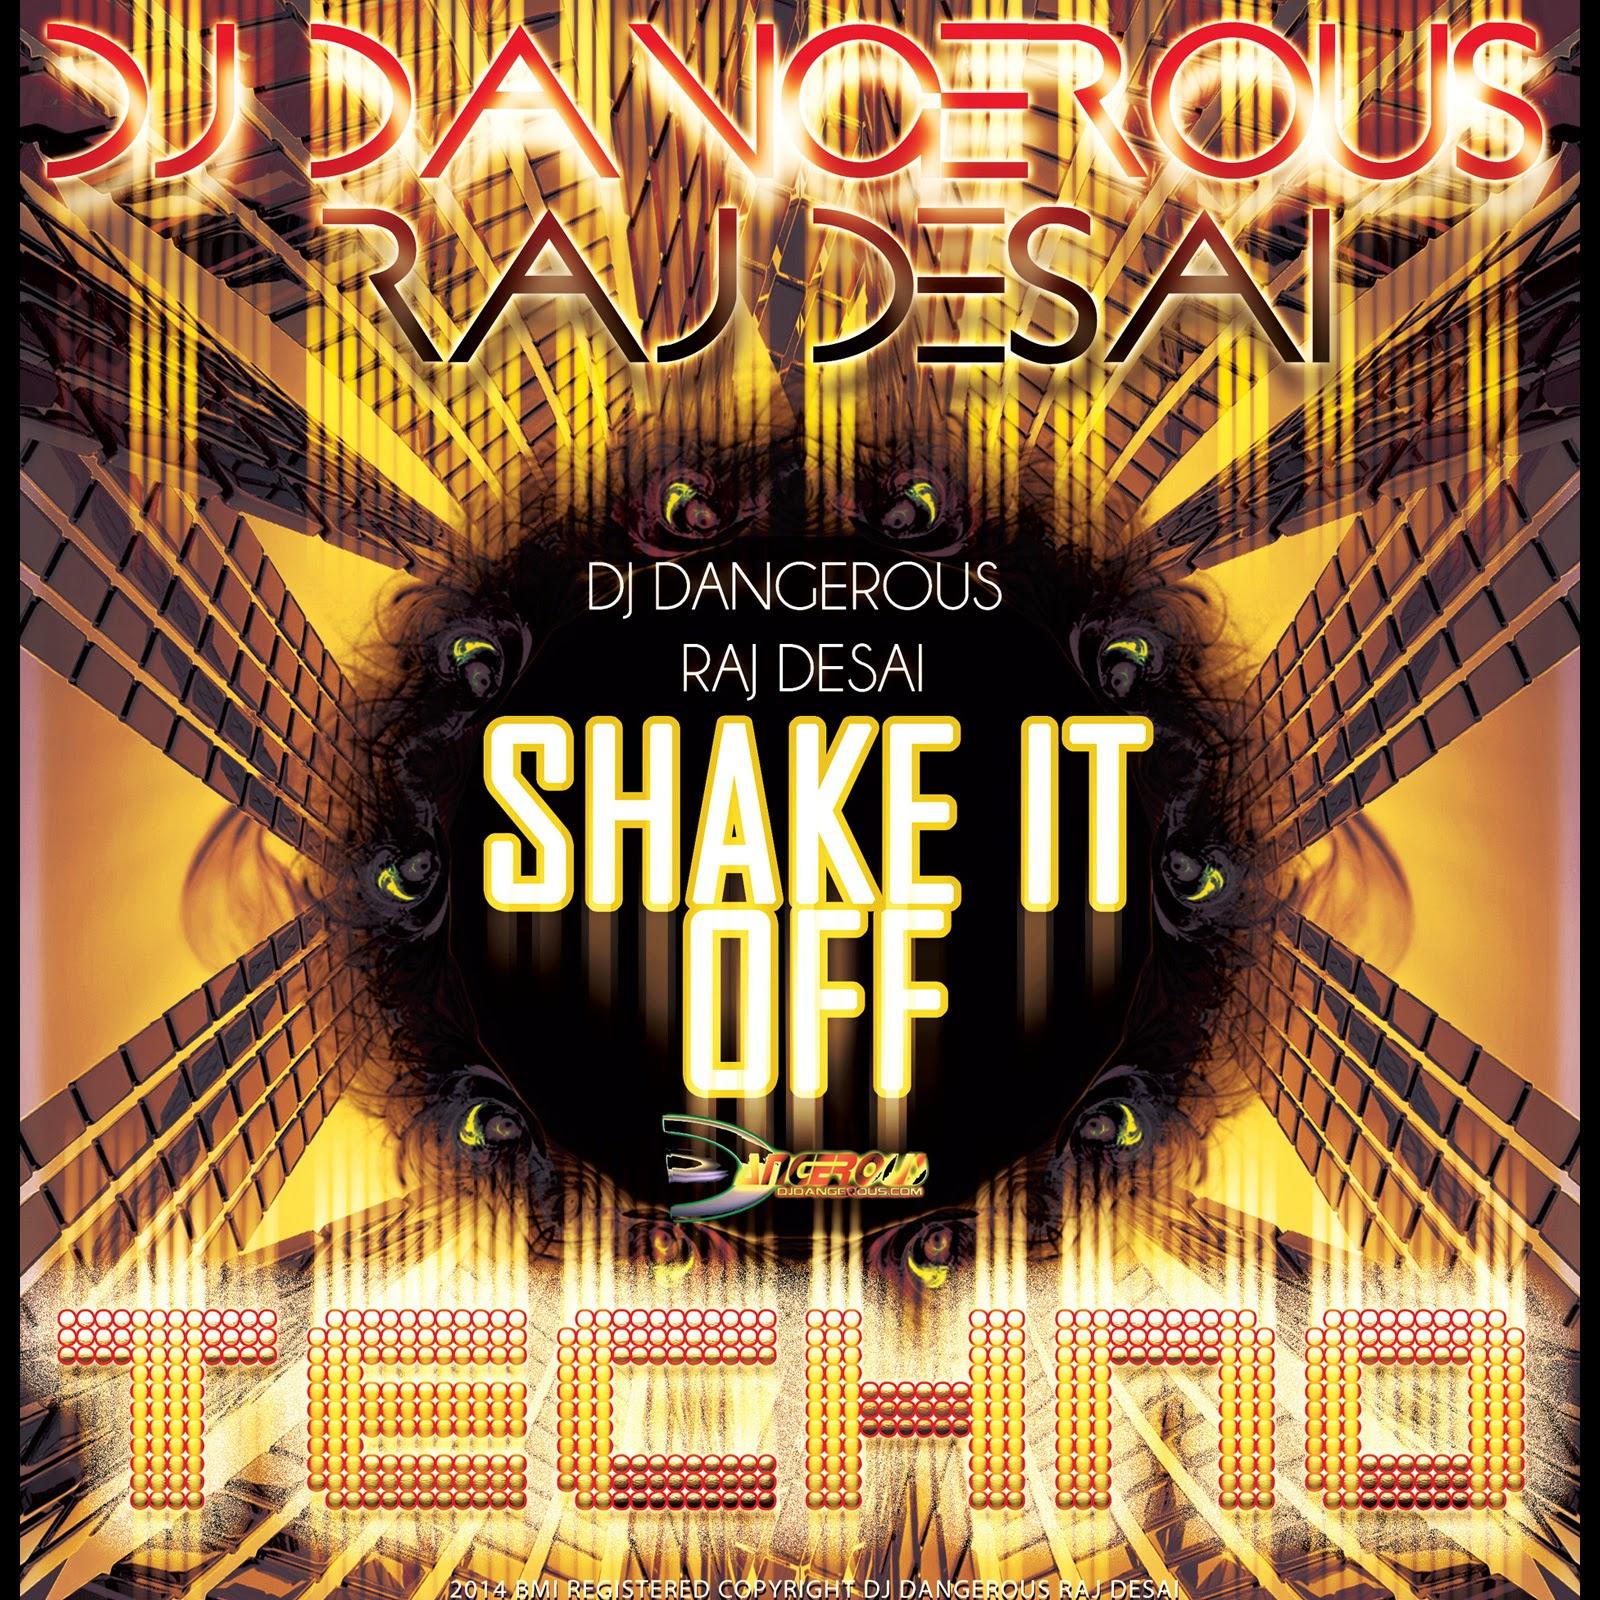 Taylor Swift Shake It Off Techno House Music 2014